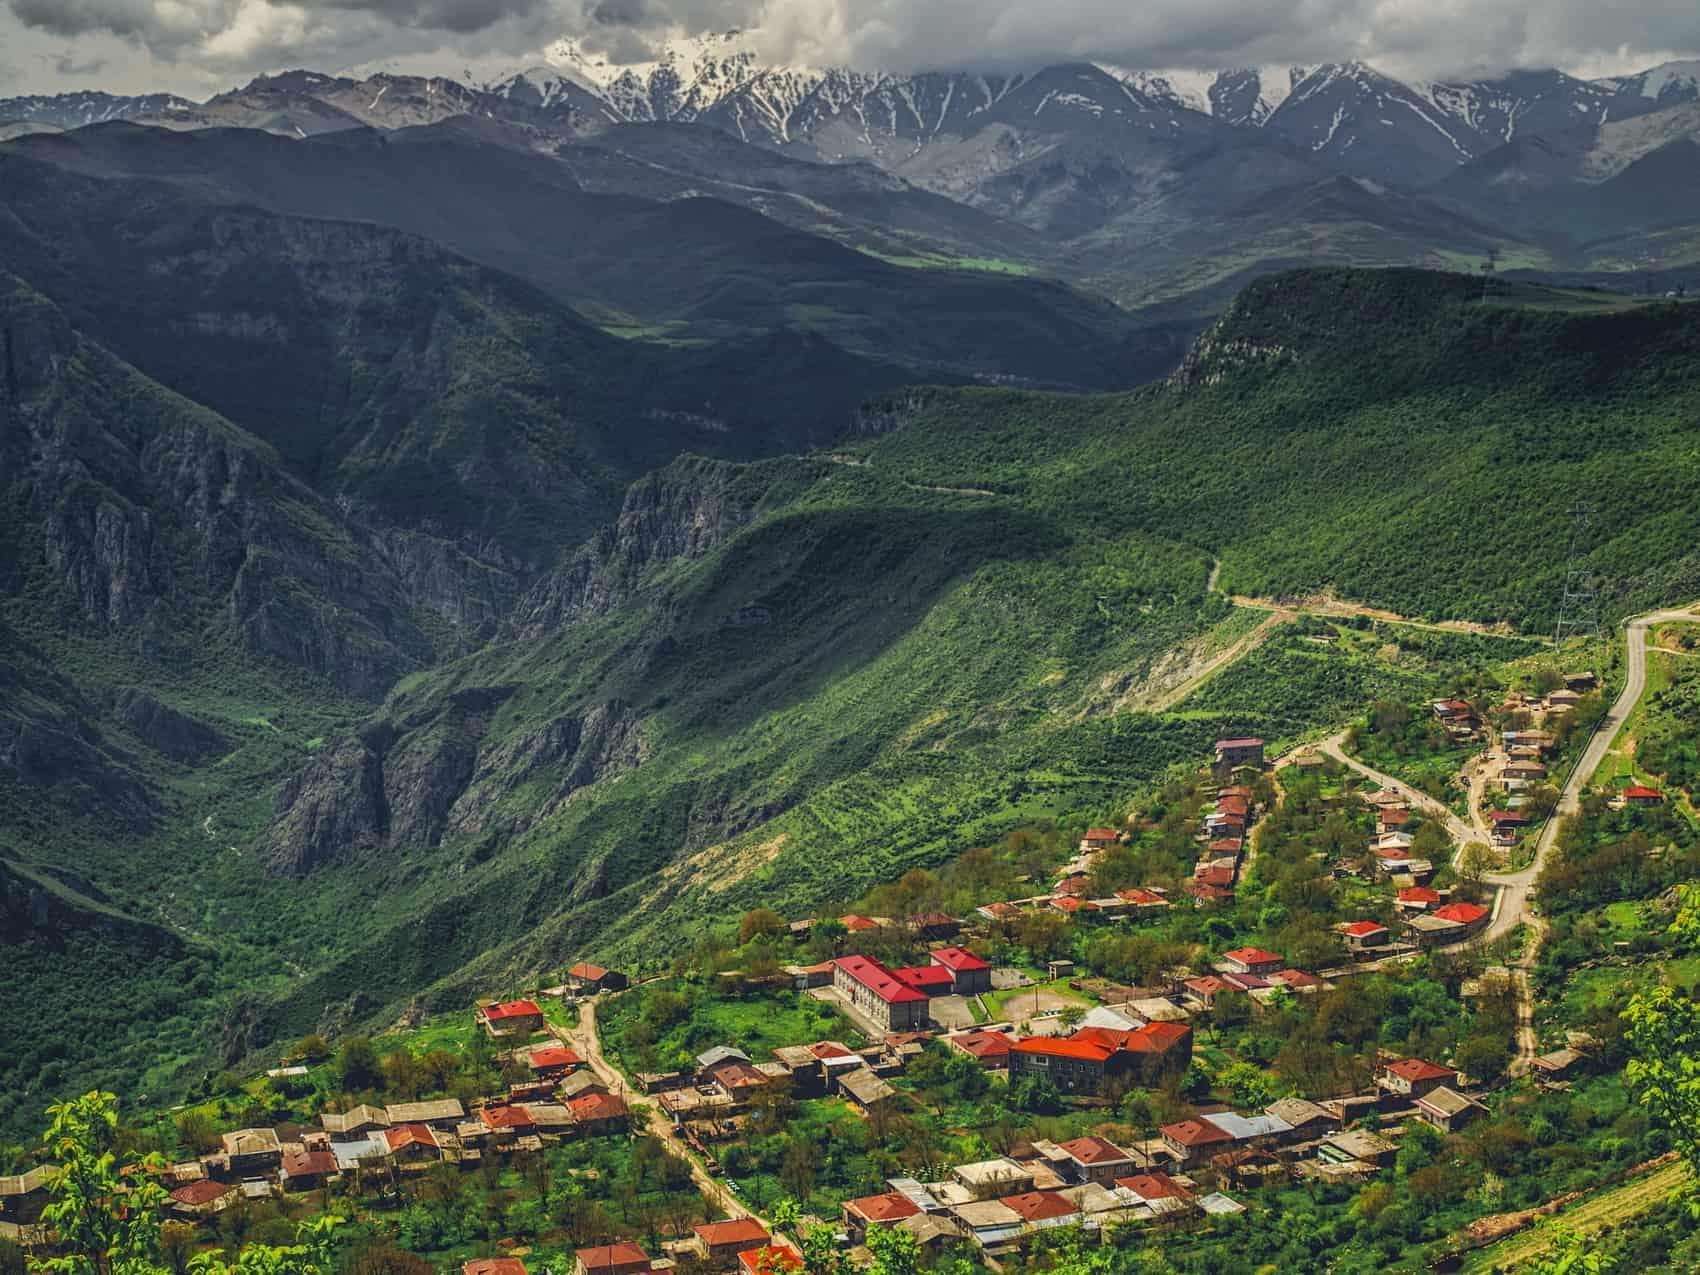 Armenien dramatsik bjerglandskab